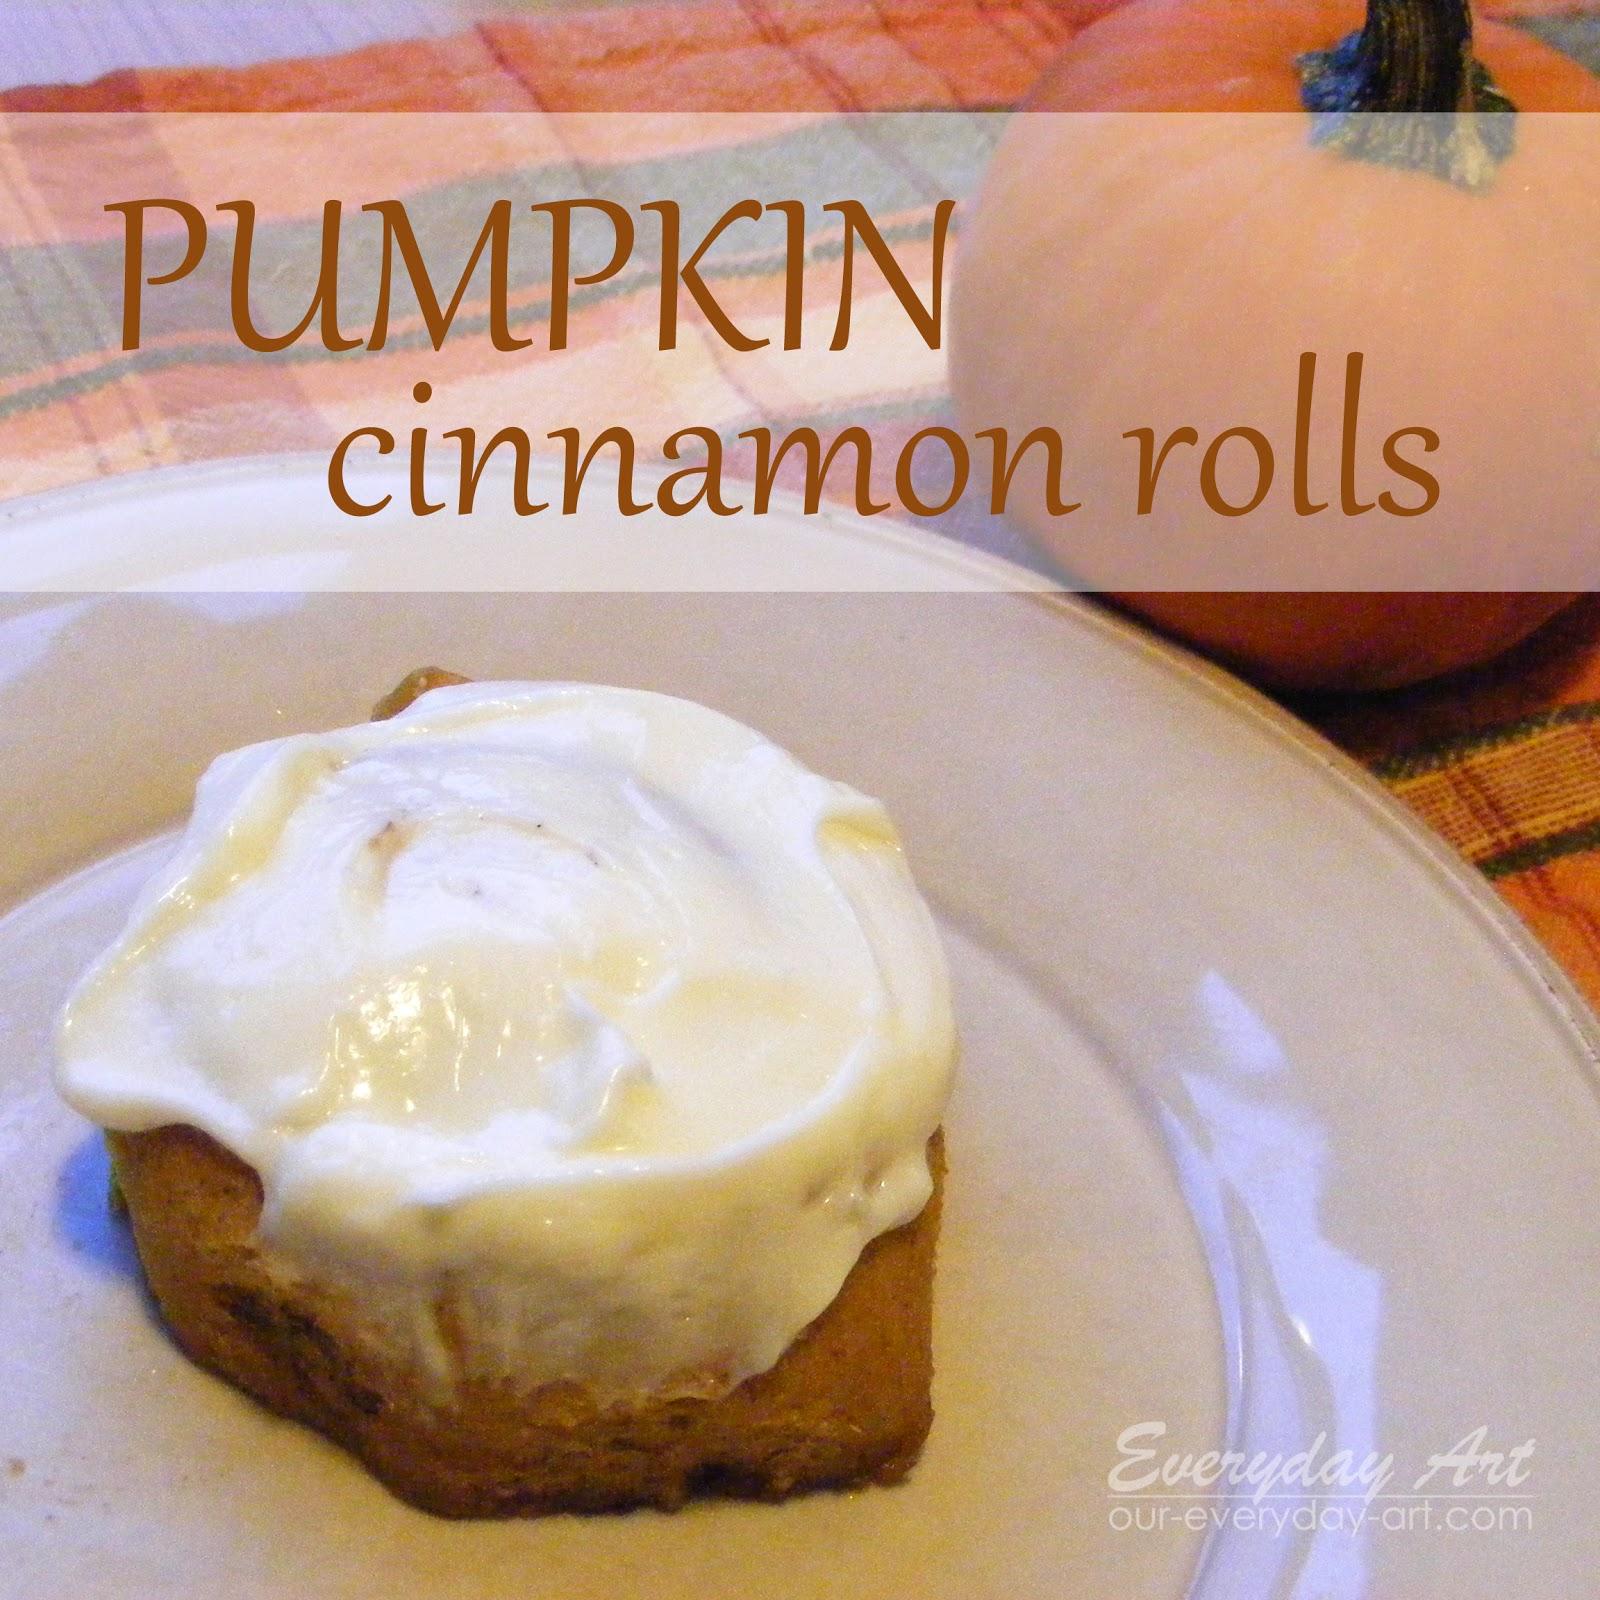 Everyday Art: Pumpkin Cinnamon Rolls